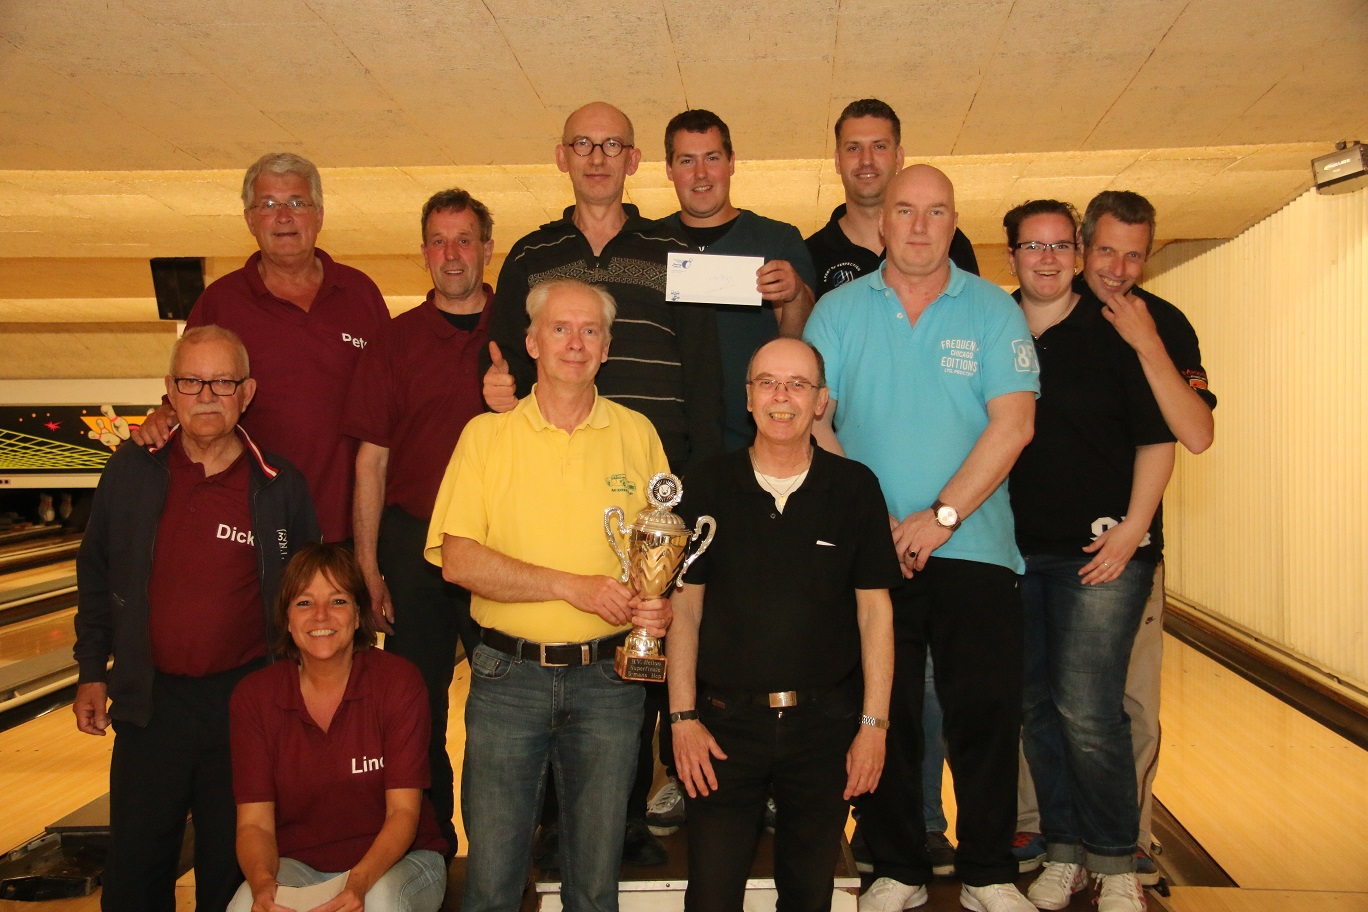 http://www.bowlingverenigingheiloo.nl/fotos_verhalen/foto's/2014_0520-SupFin-Hcp4.jpg